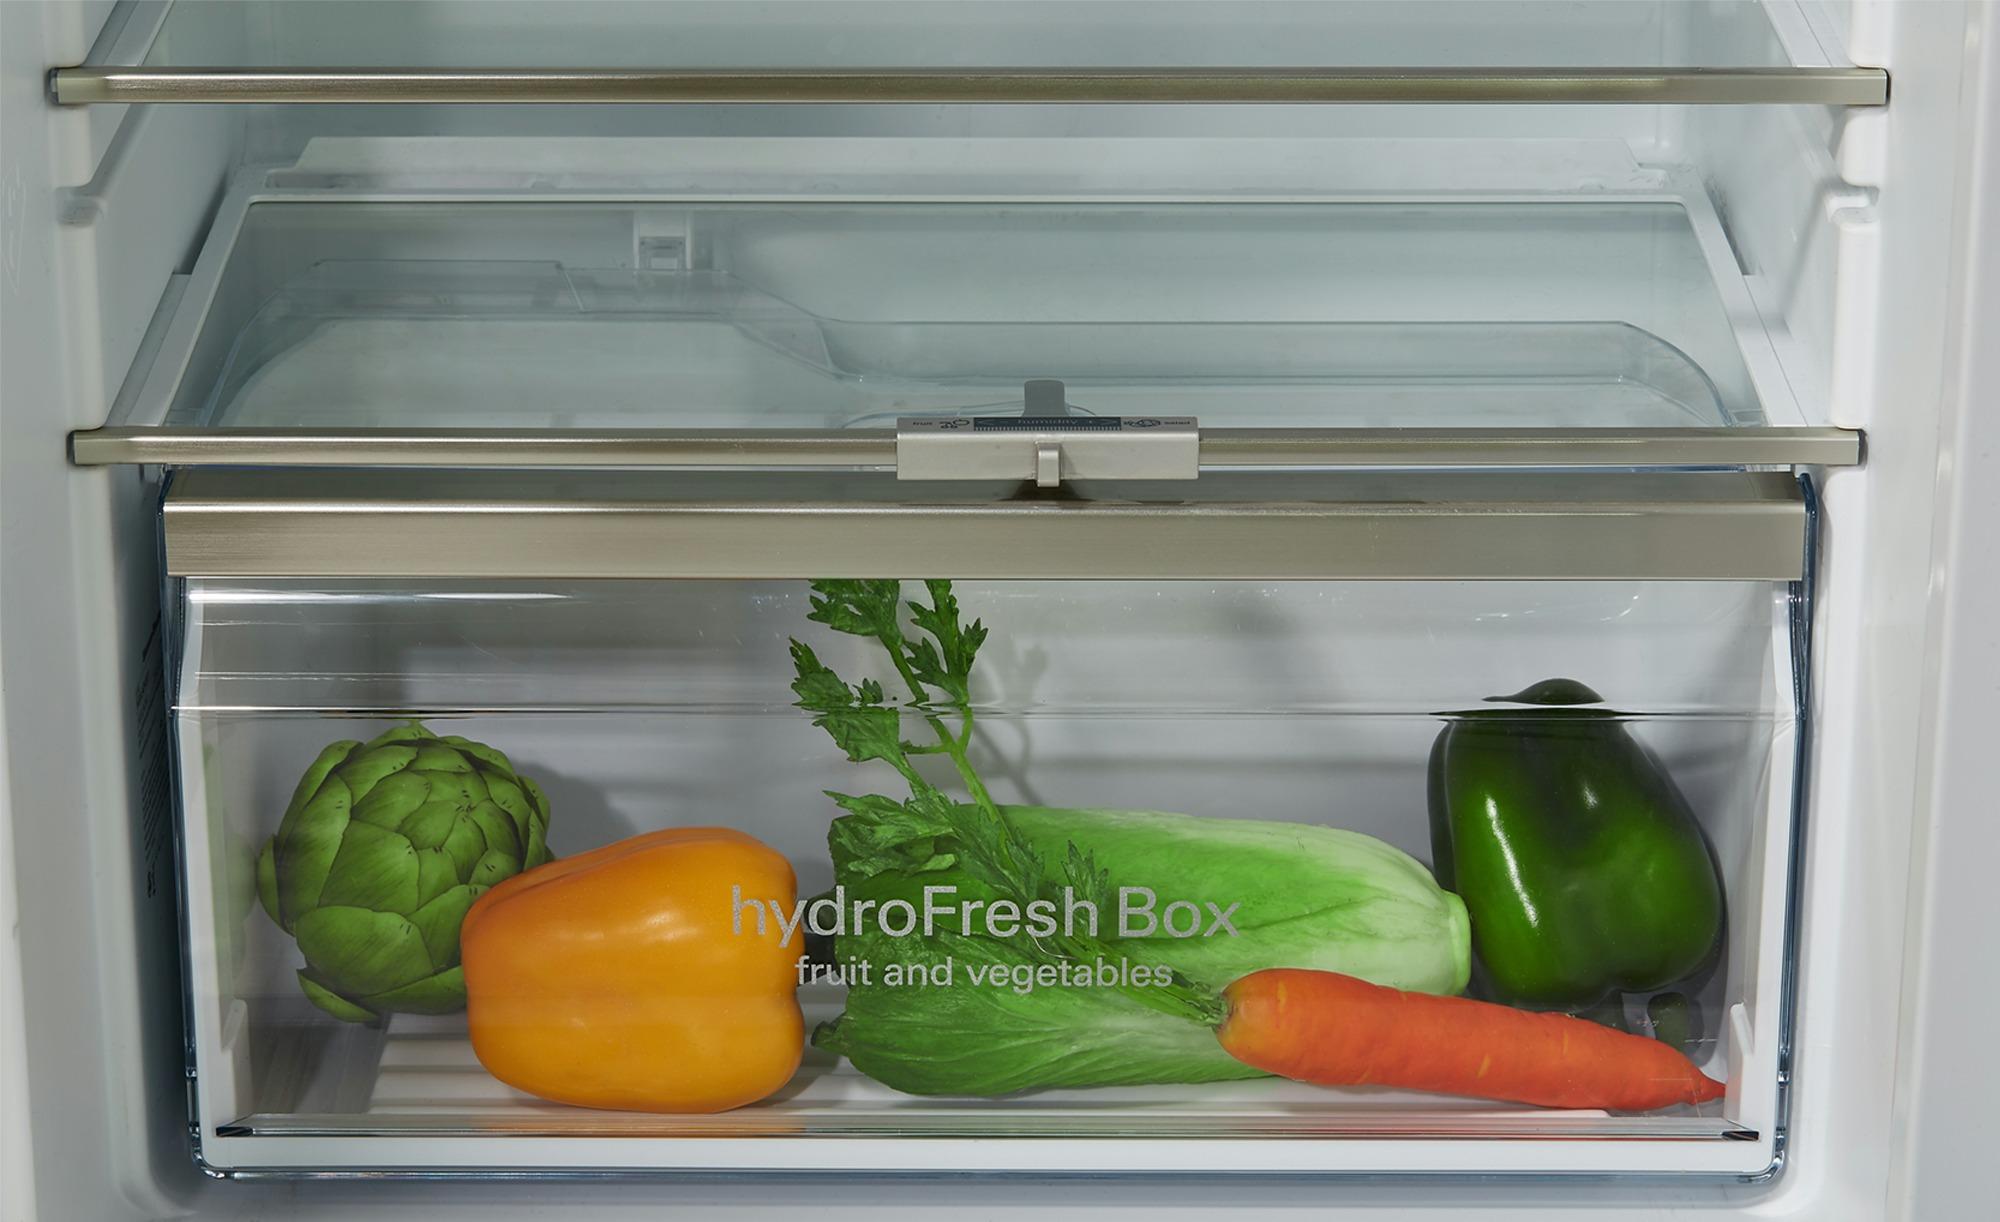 Siemens Kühlschrank Hydrofresh Box : Siemens einbau kühlschrank ki lad möbel höffner